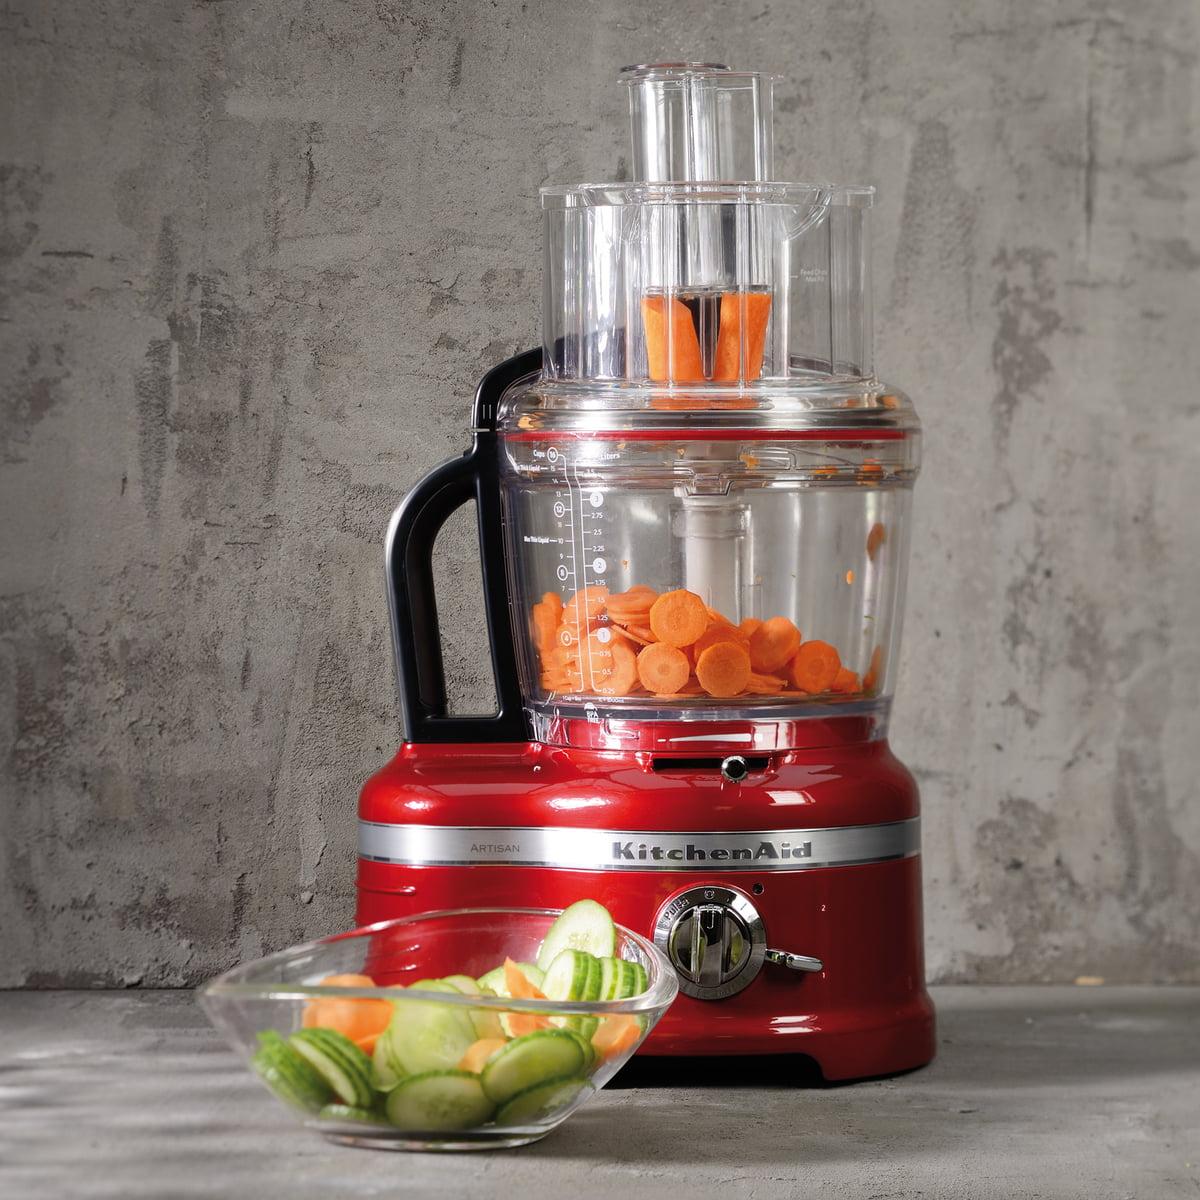 KitchenAid   Artisan Food Processor 4,0 L, Empire Red